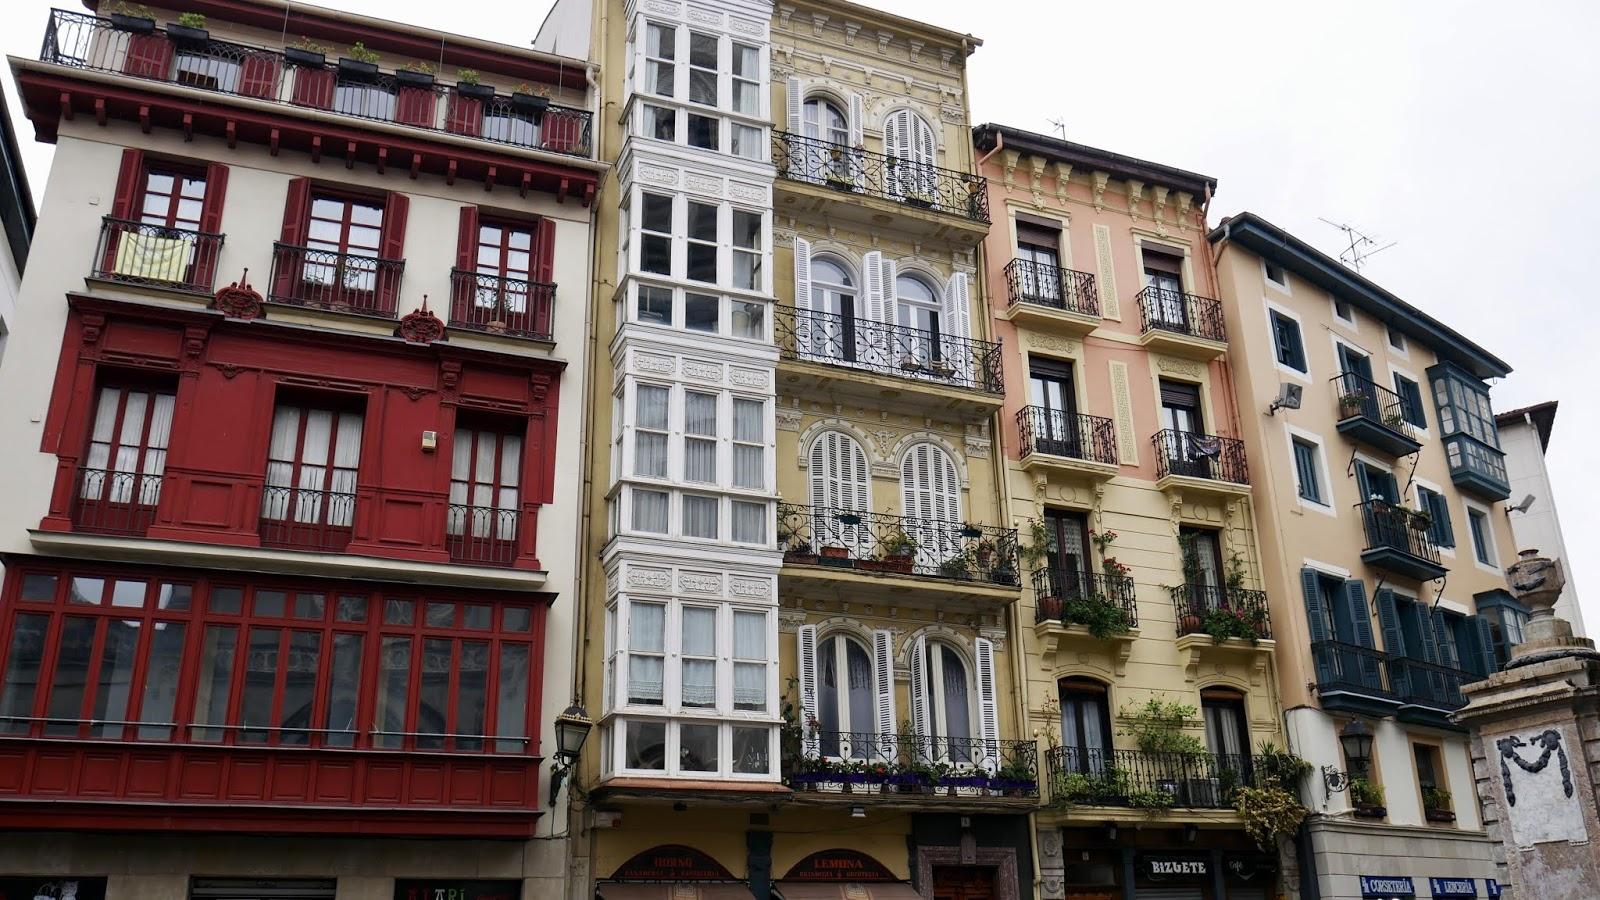 Casco Viejo Bilbao Pais Vasco España